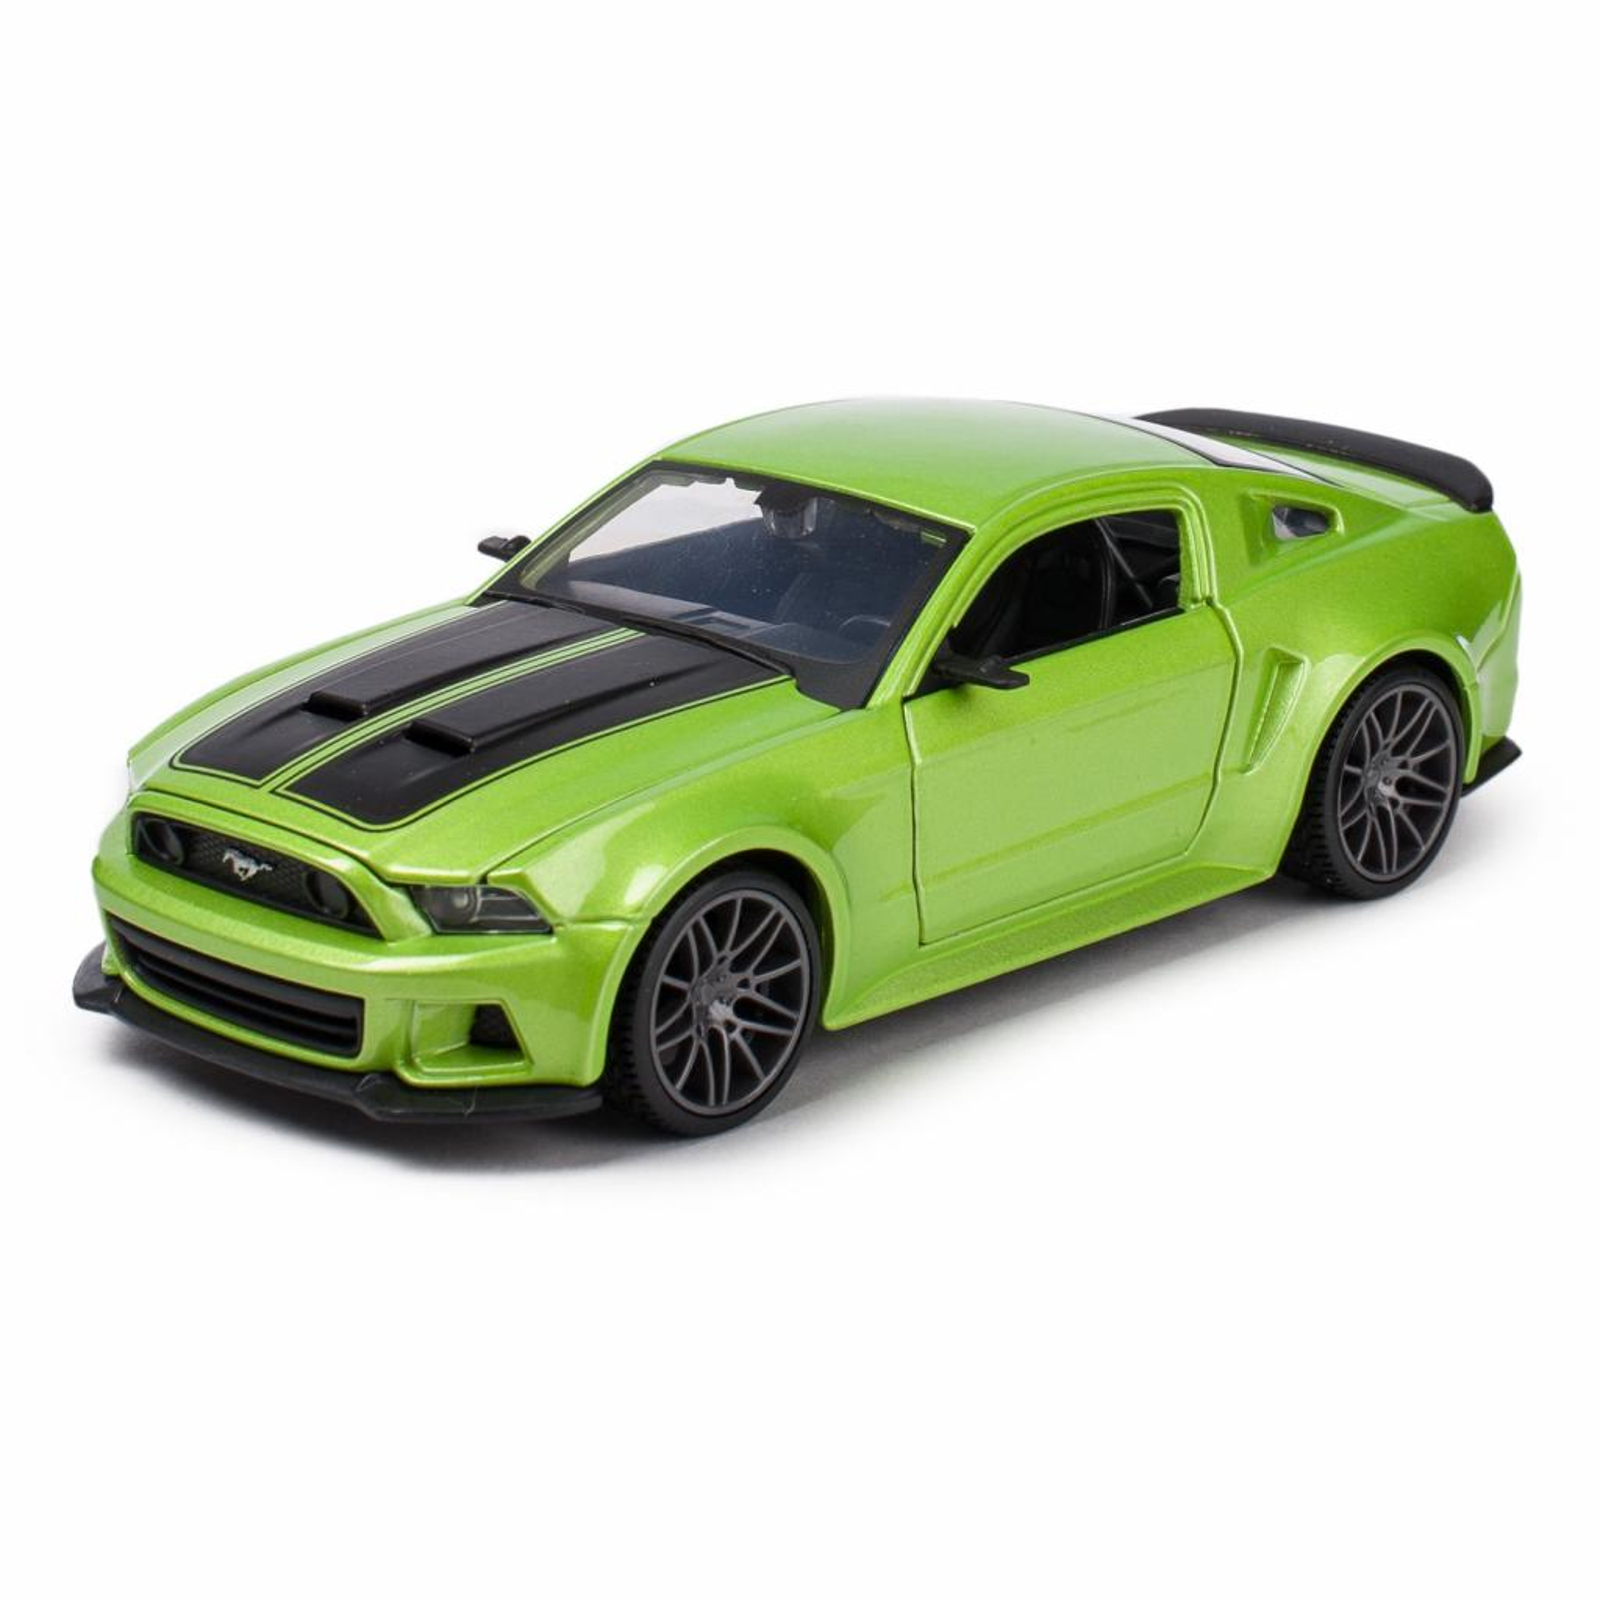 Машина Maisto Ford Mustang Street Racer 2014 (1:24) зеленый металлик (31506 met. green)